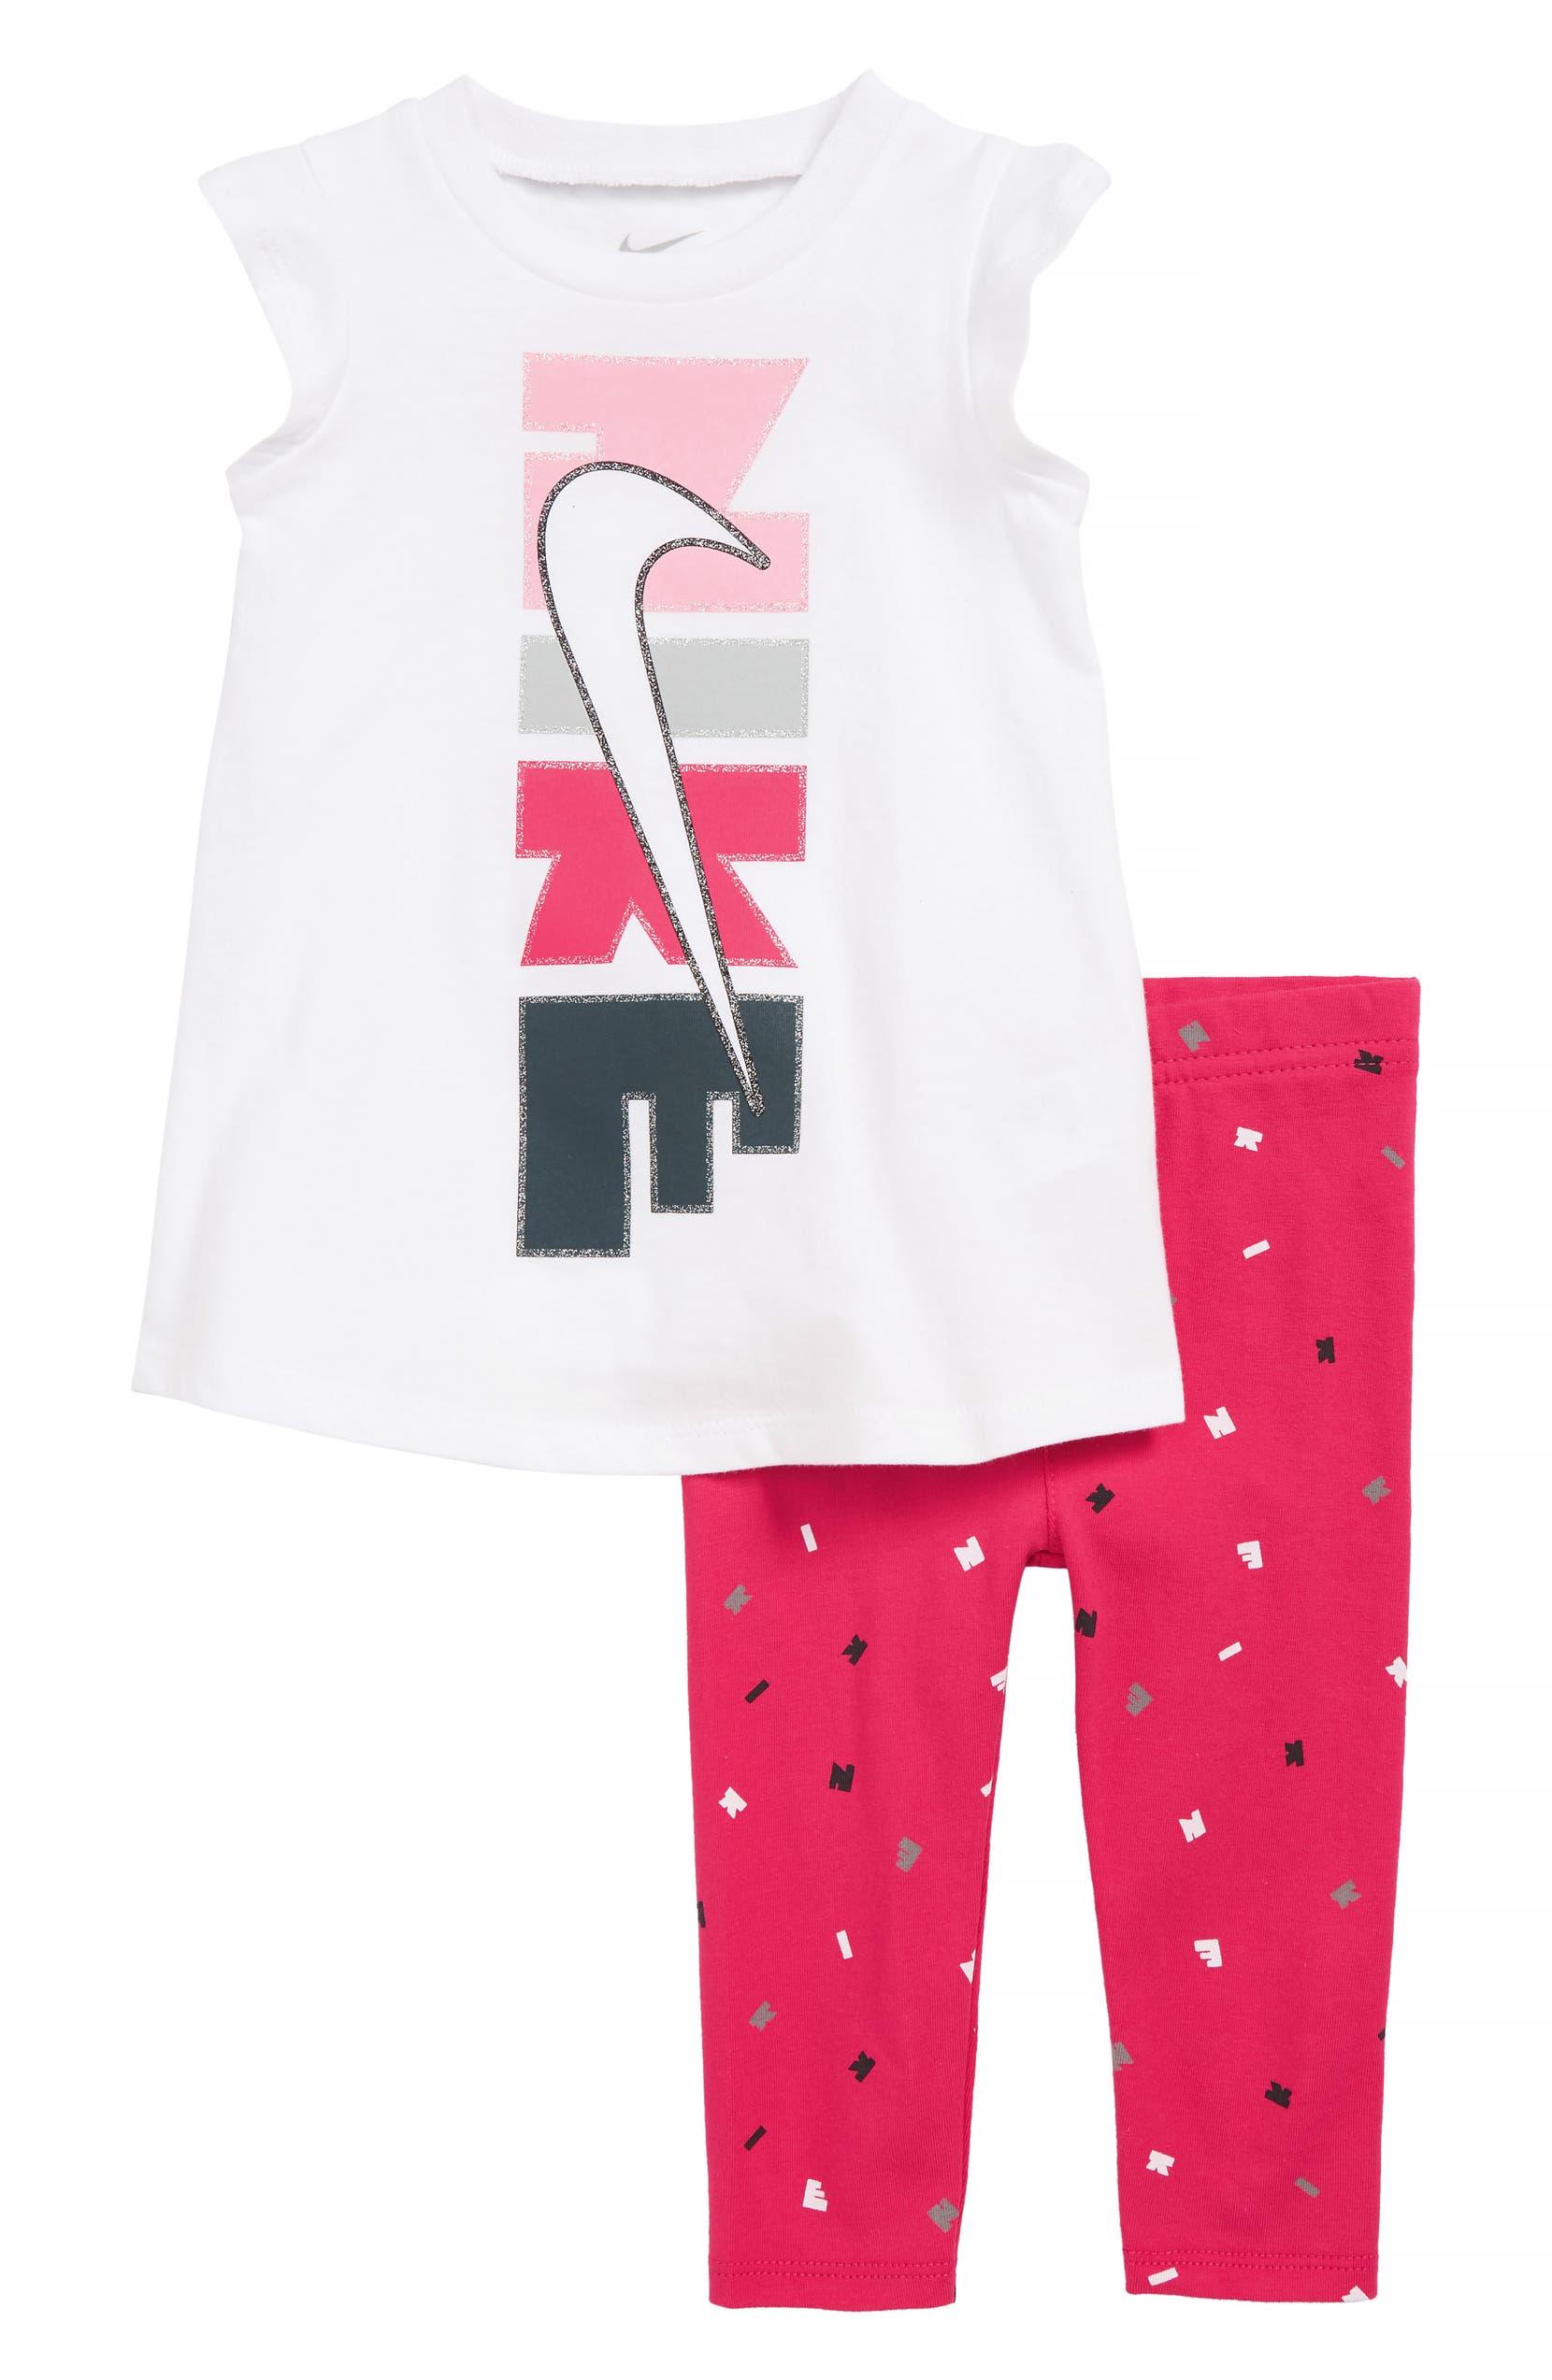 new appearance low price latest design Logo Graphic Tunic & Print Leggings Set